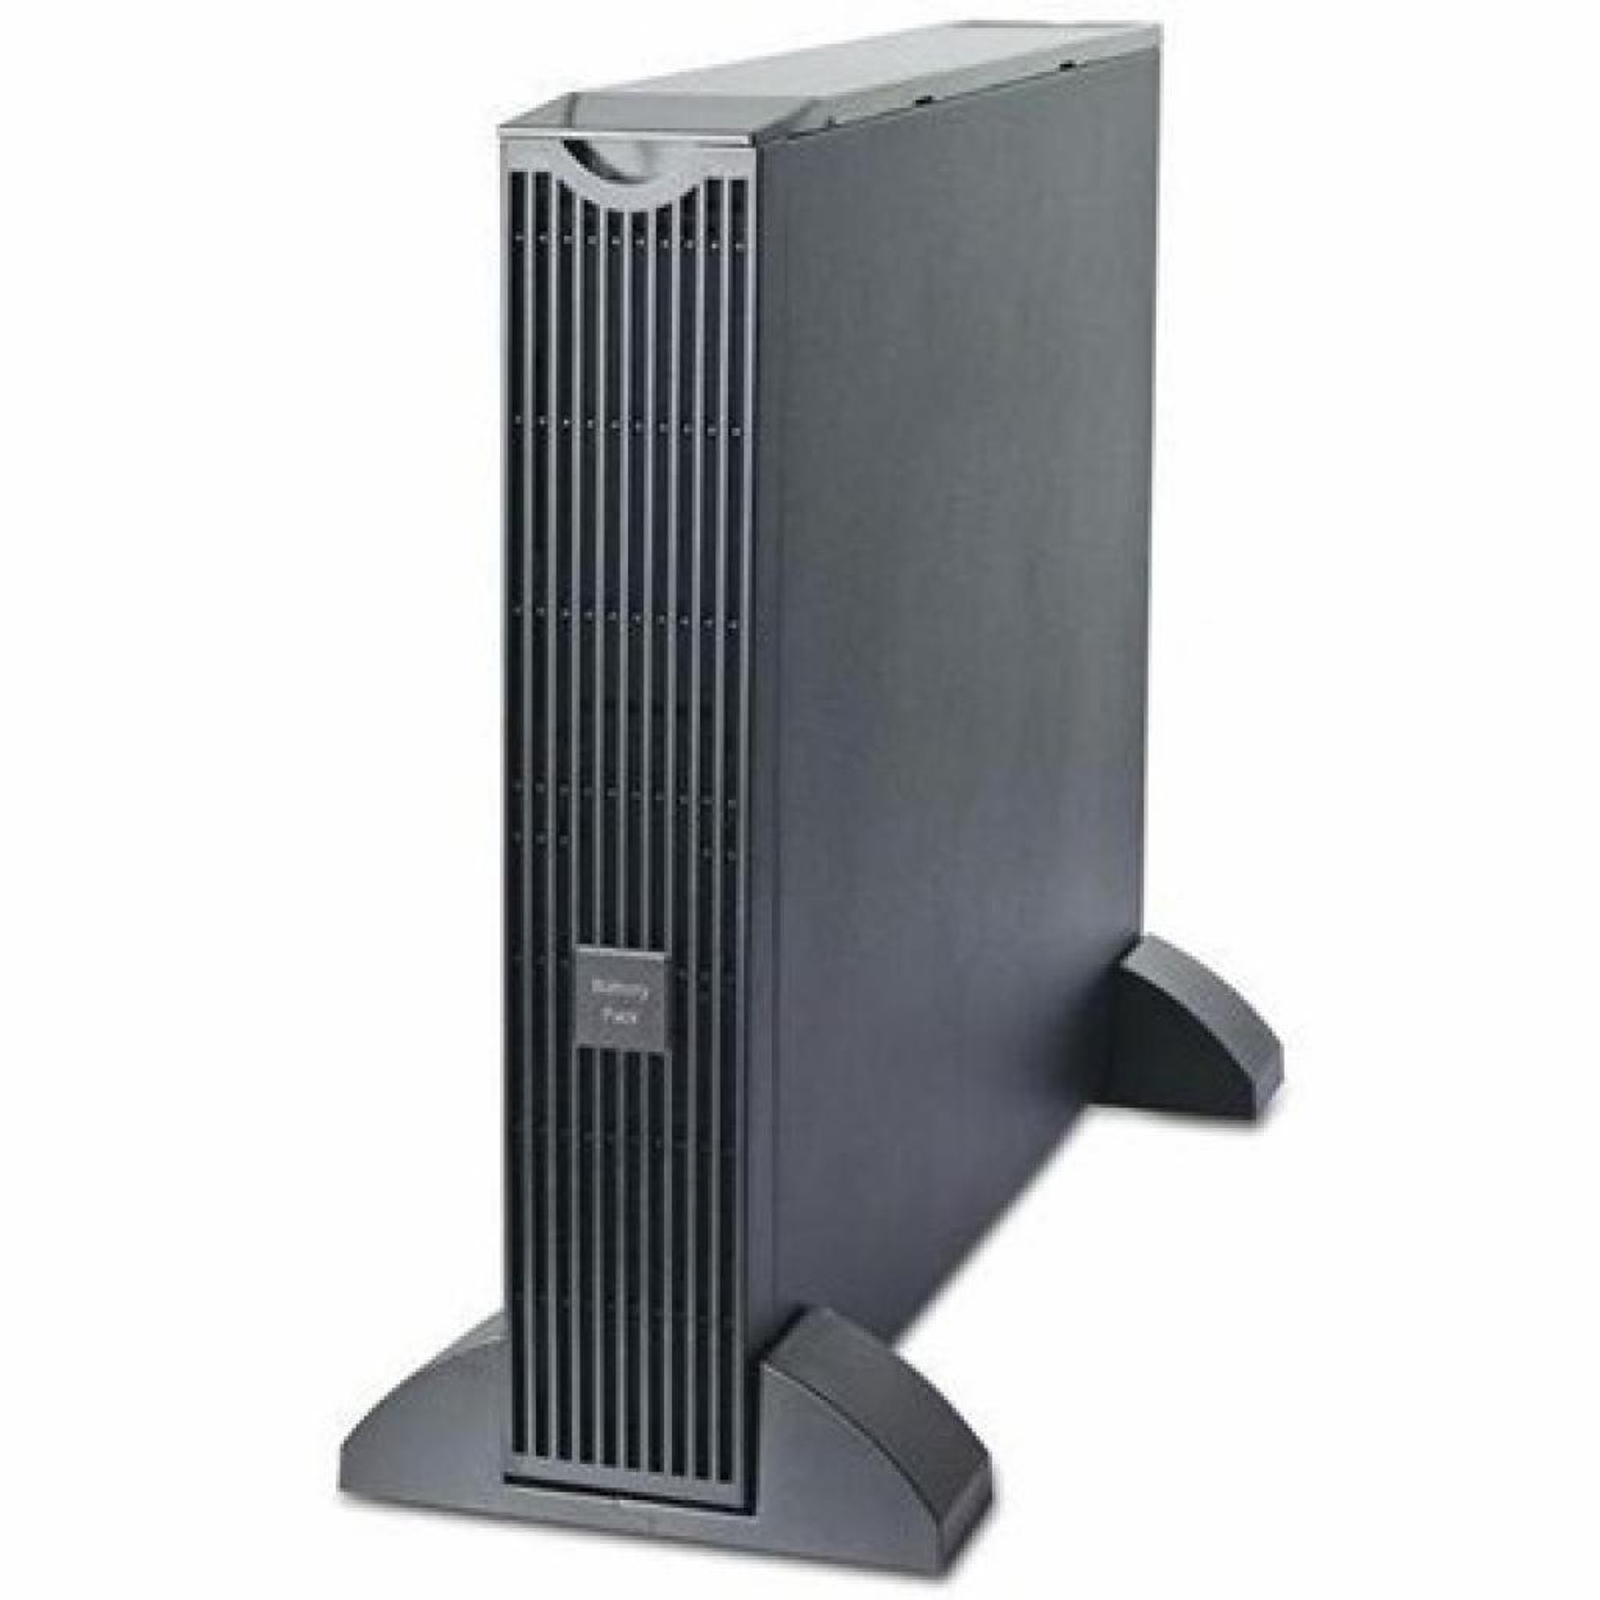 Батарея к ИБП Батарея APC для Smart-UPS RT 1-2kVA APC (SURT48XLBP)